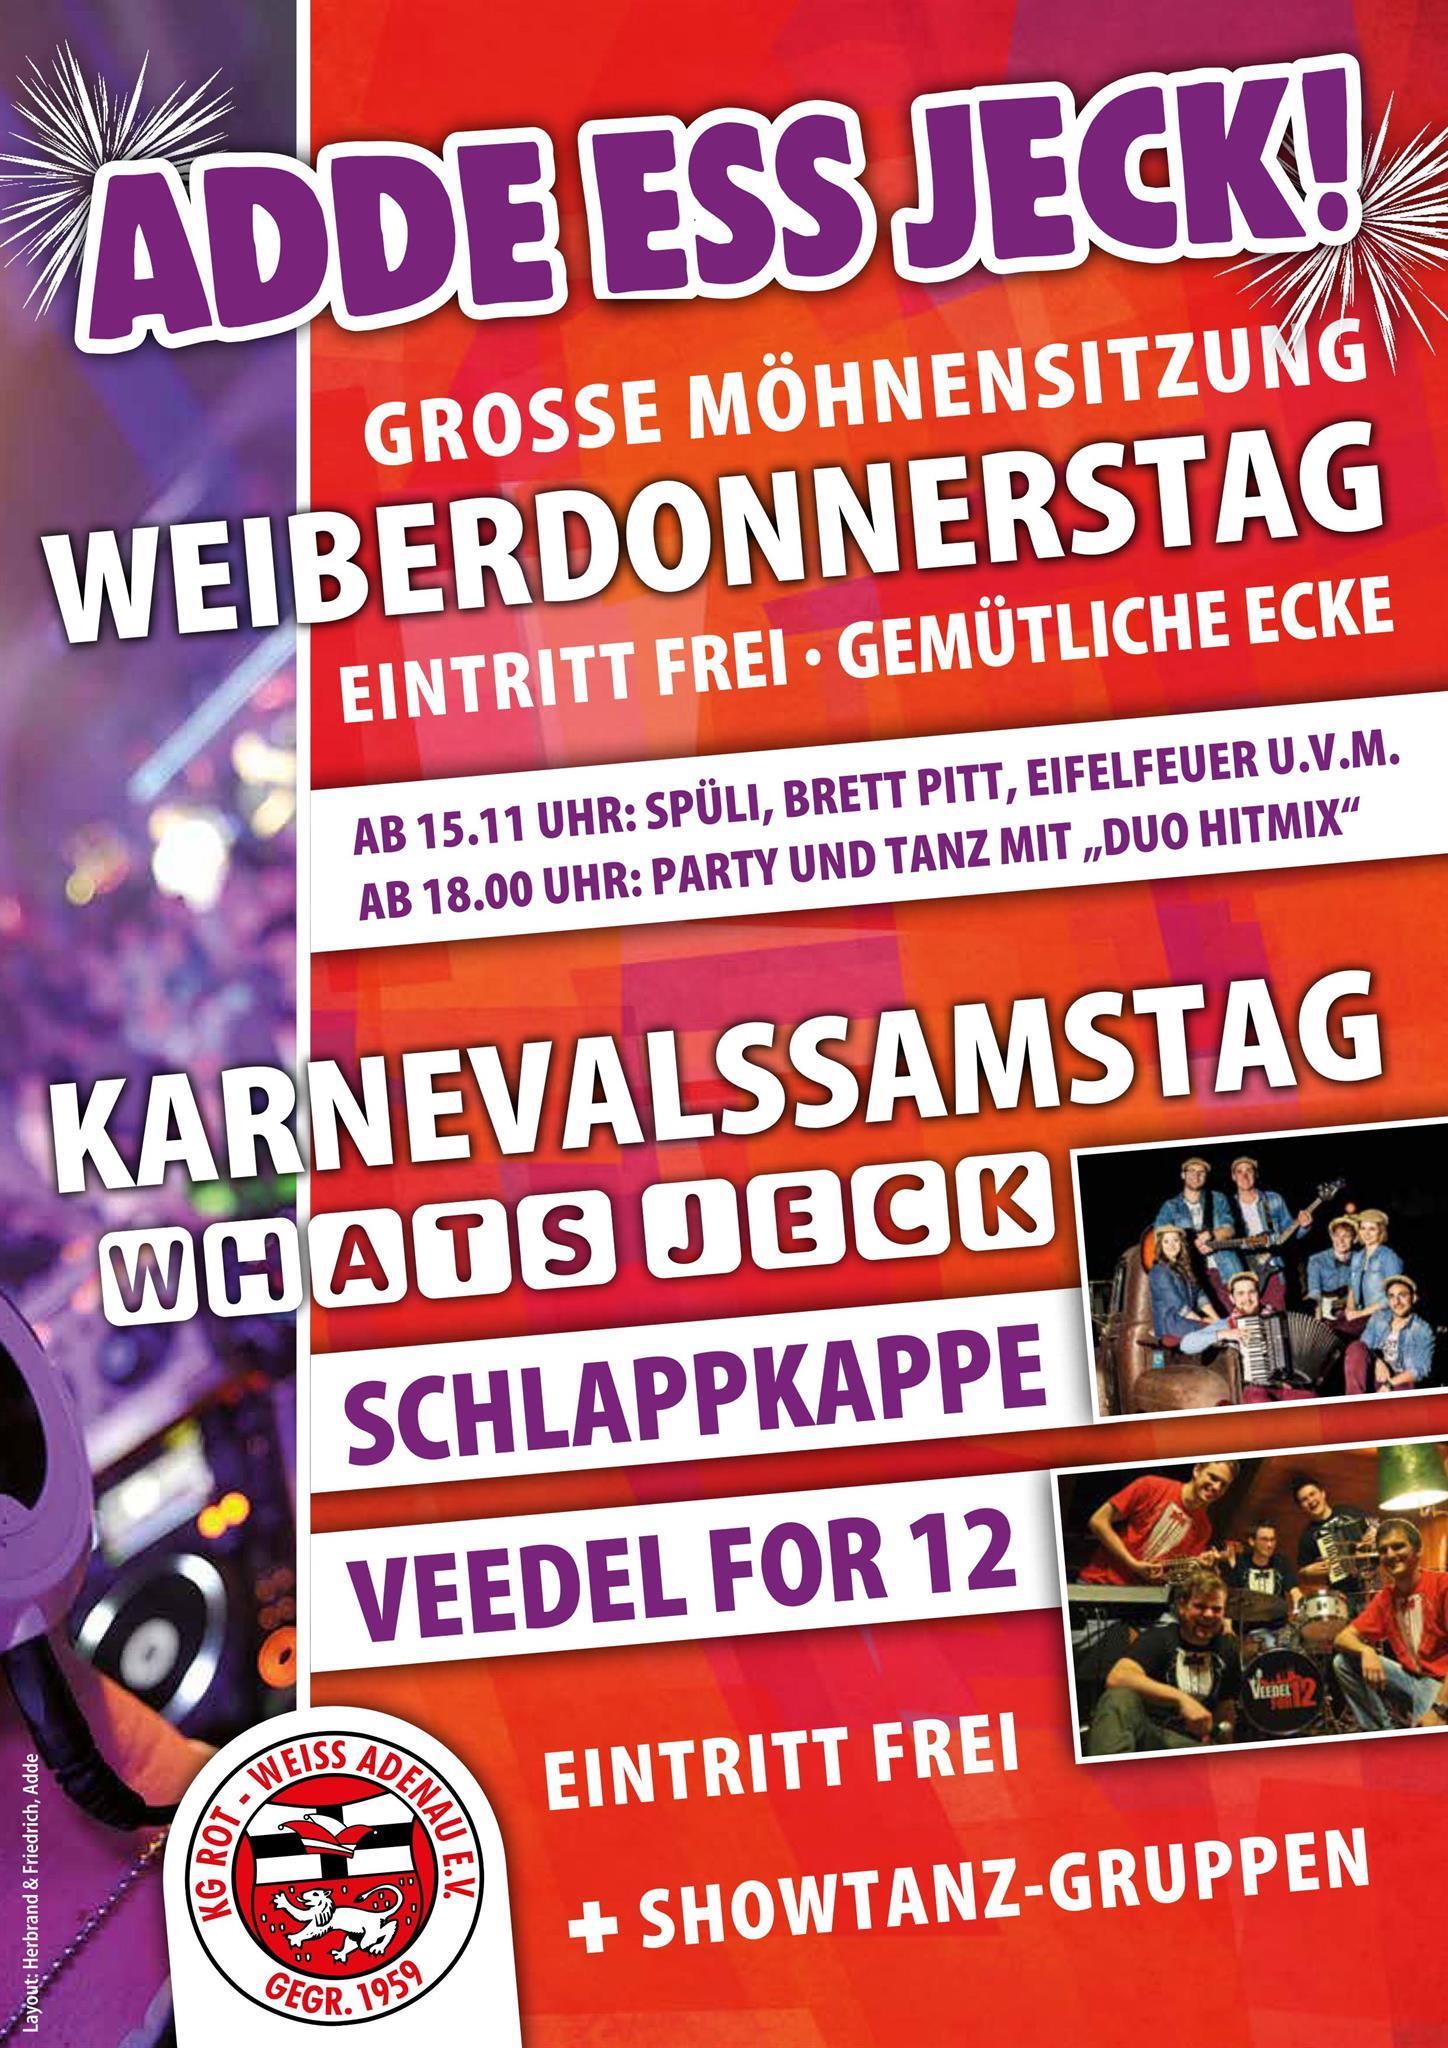 Plakat Adde Ess Jeck!, @ KG Rot-Weiß Adenau e. V.